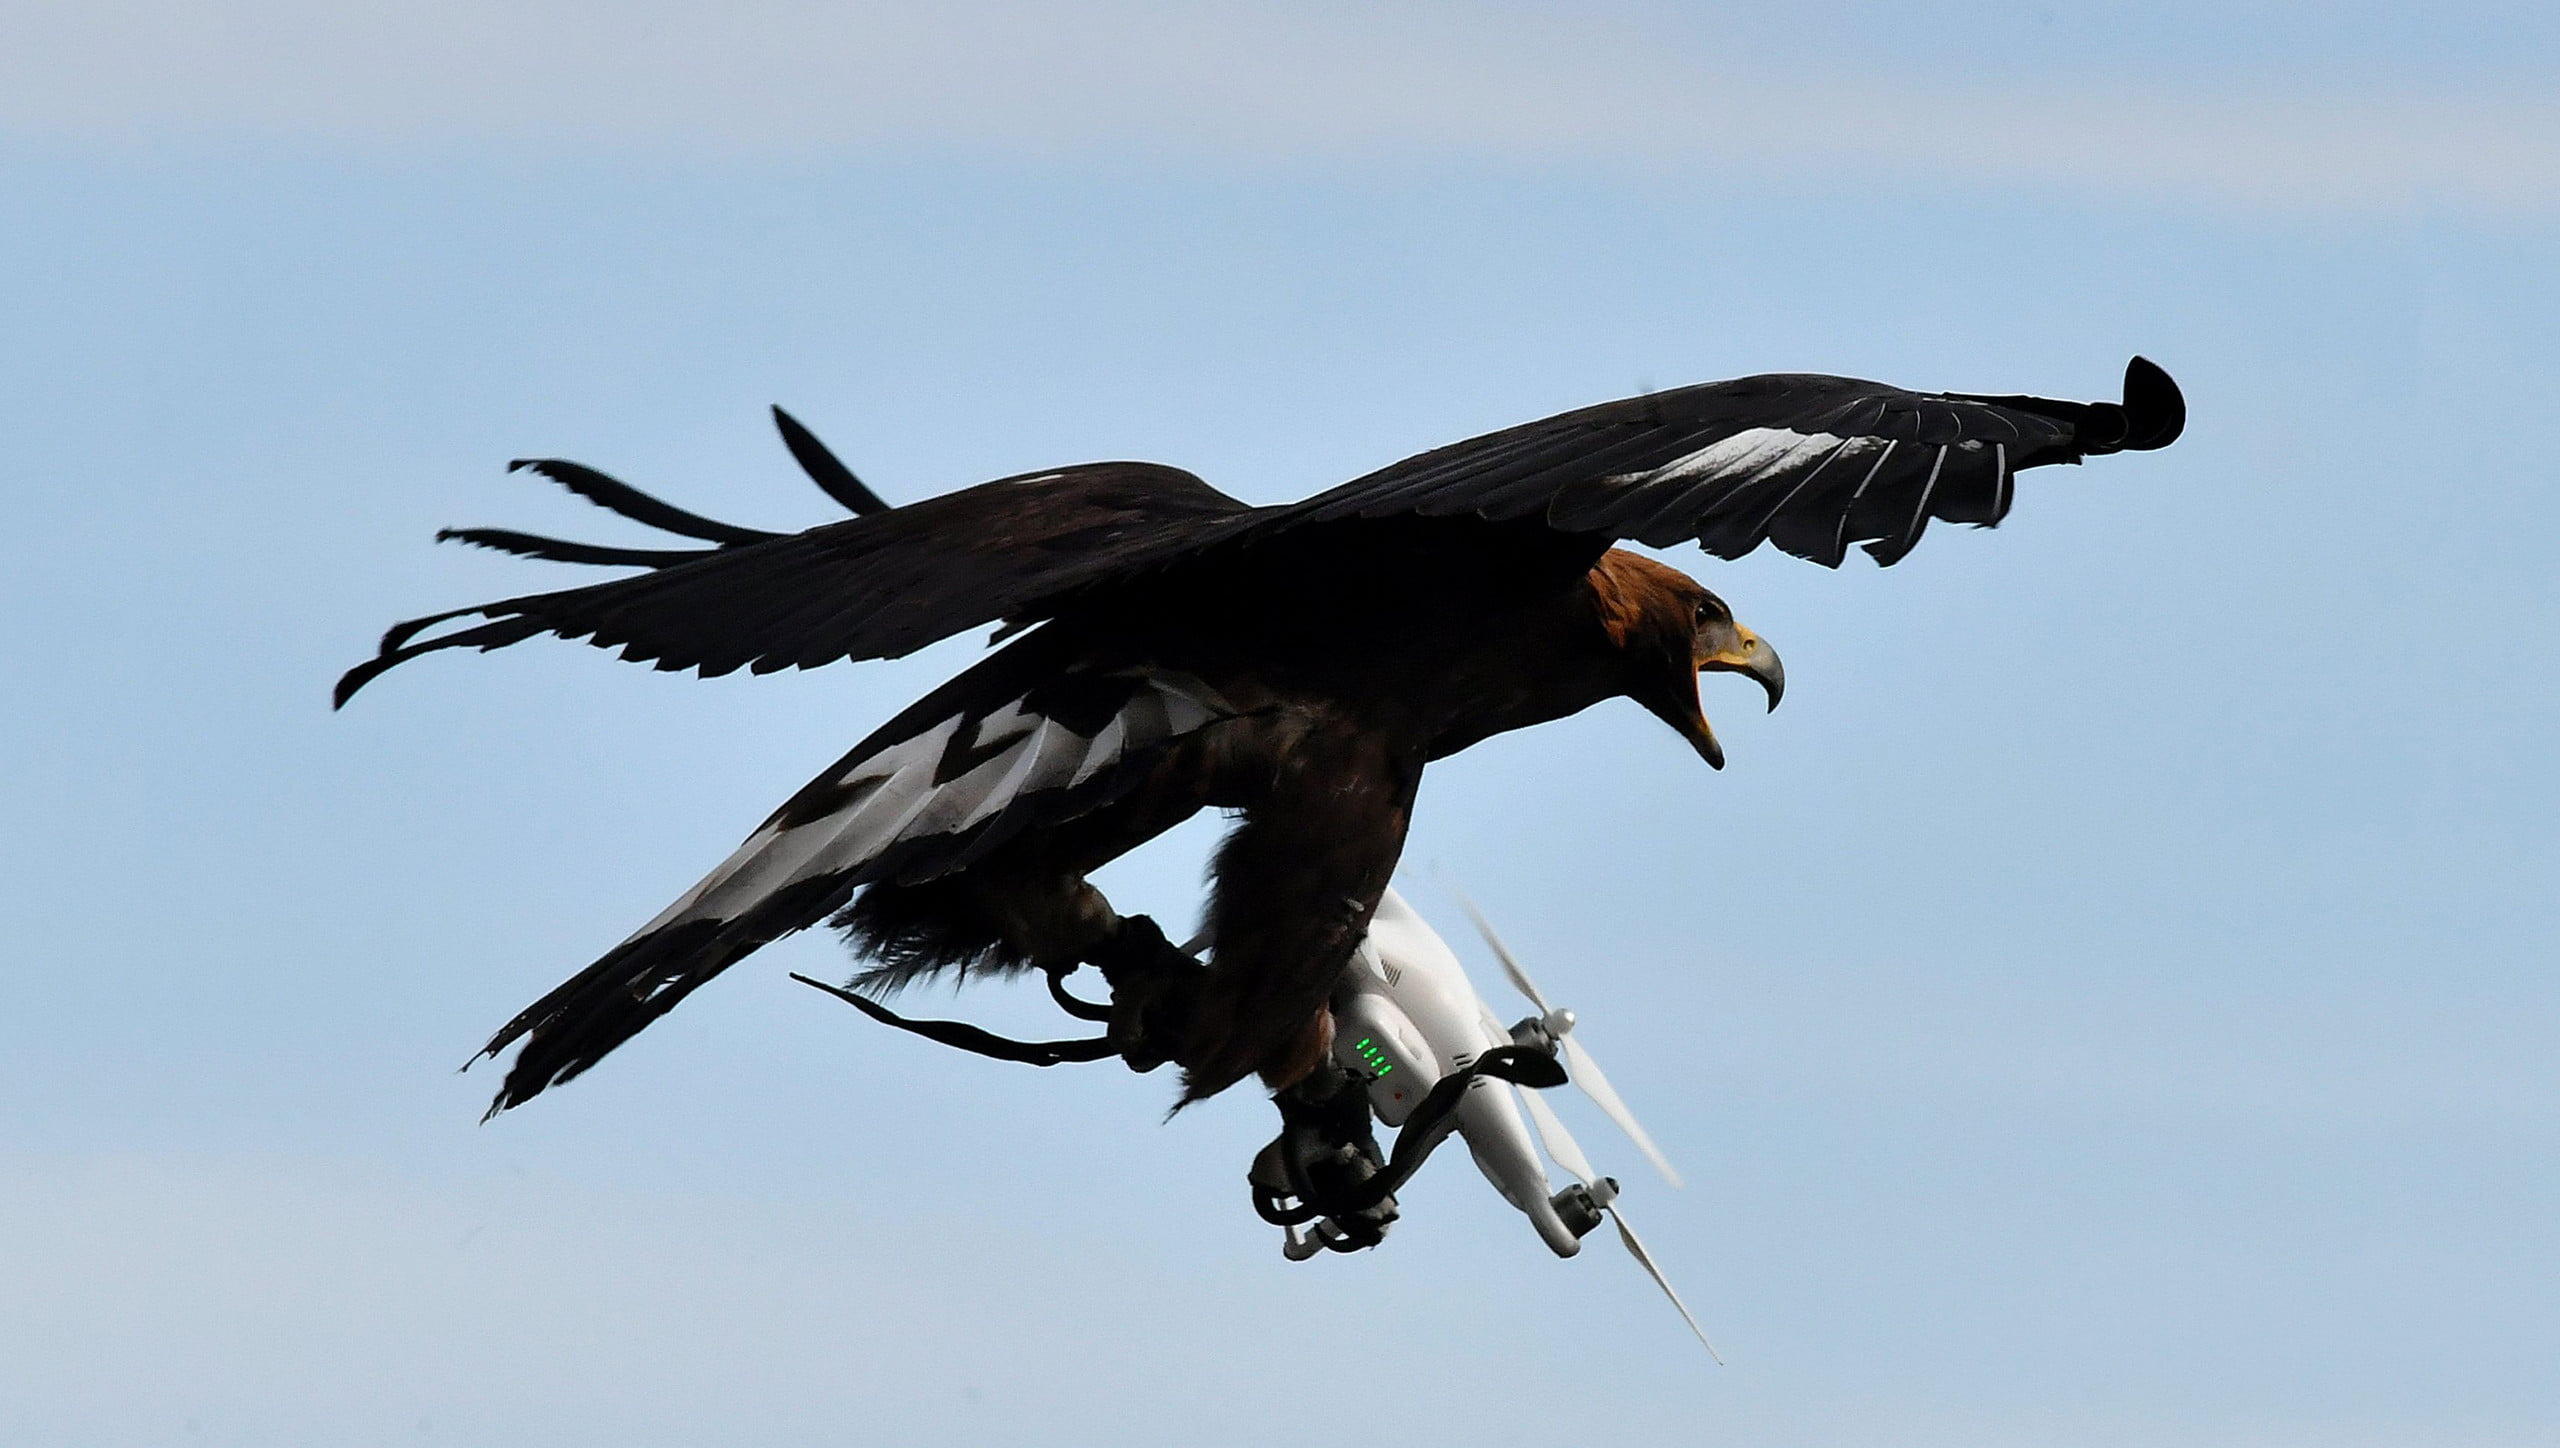 eagle drone capture